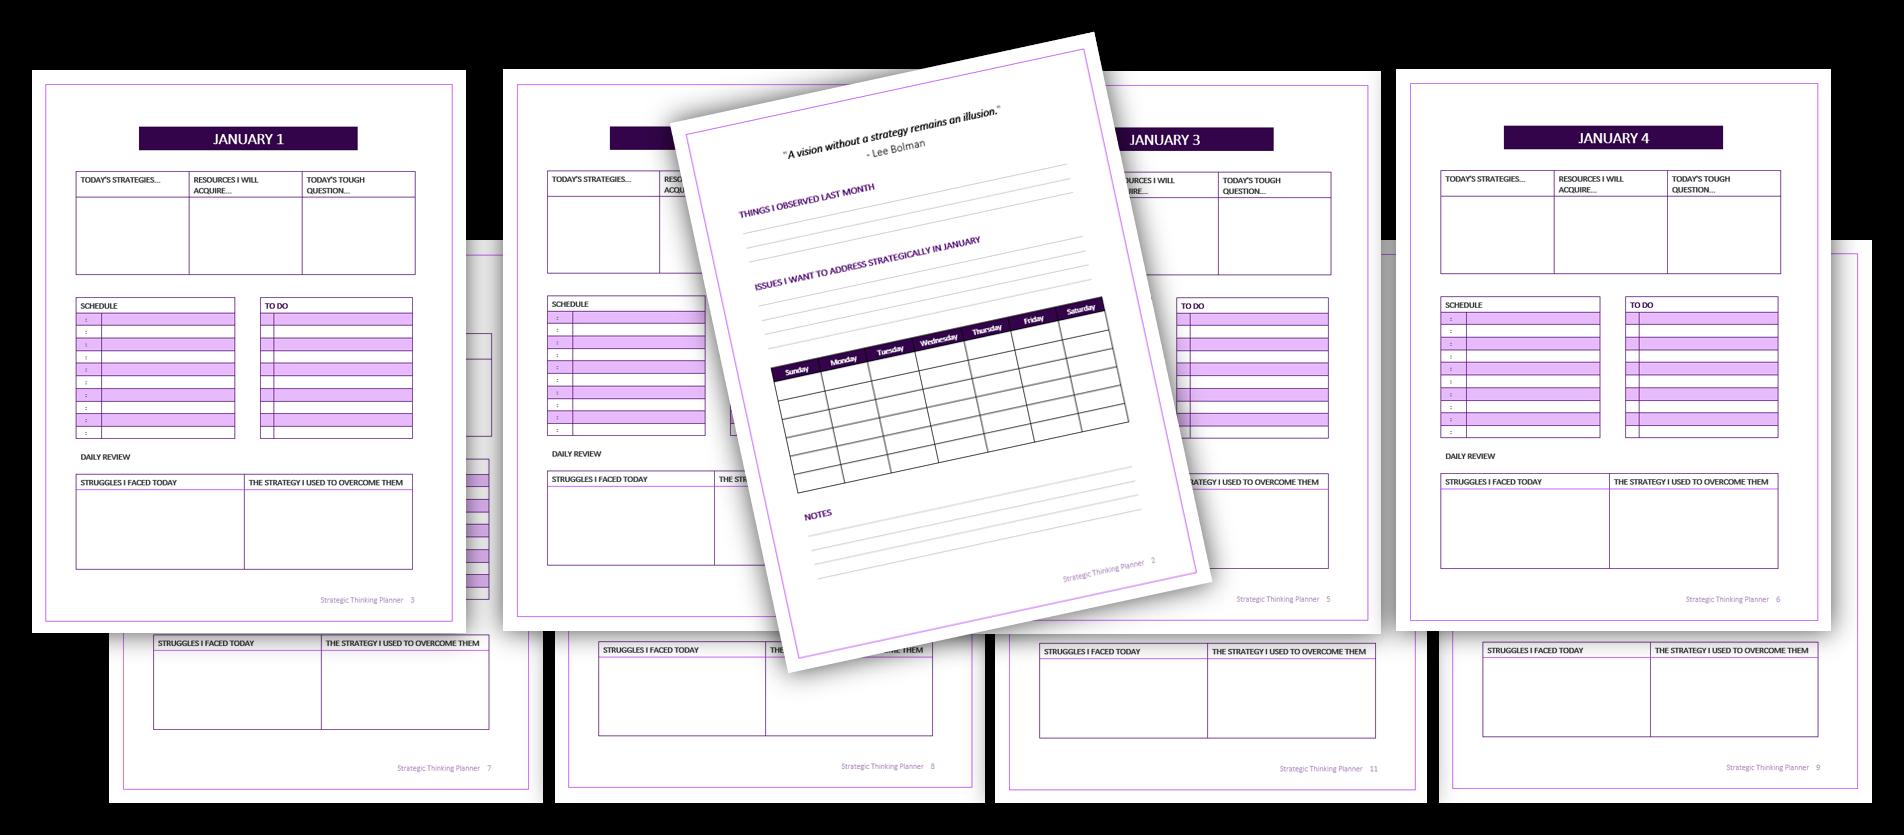 Strategic Thinking Planner image 2